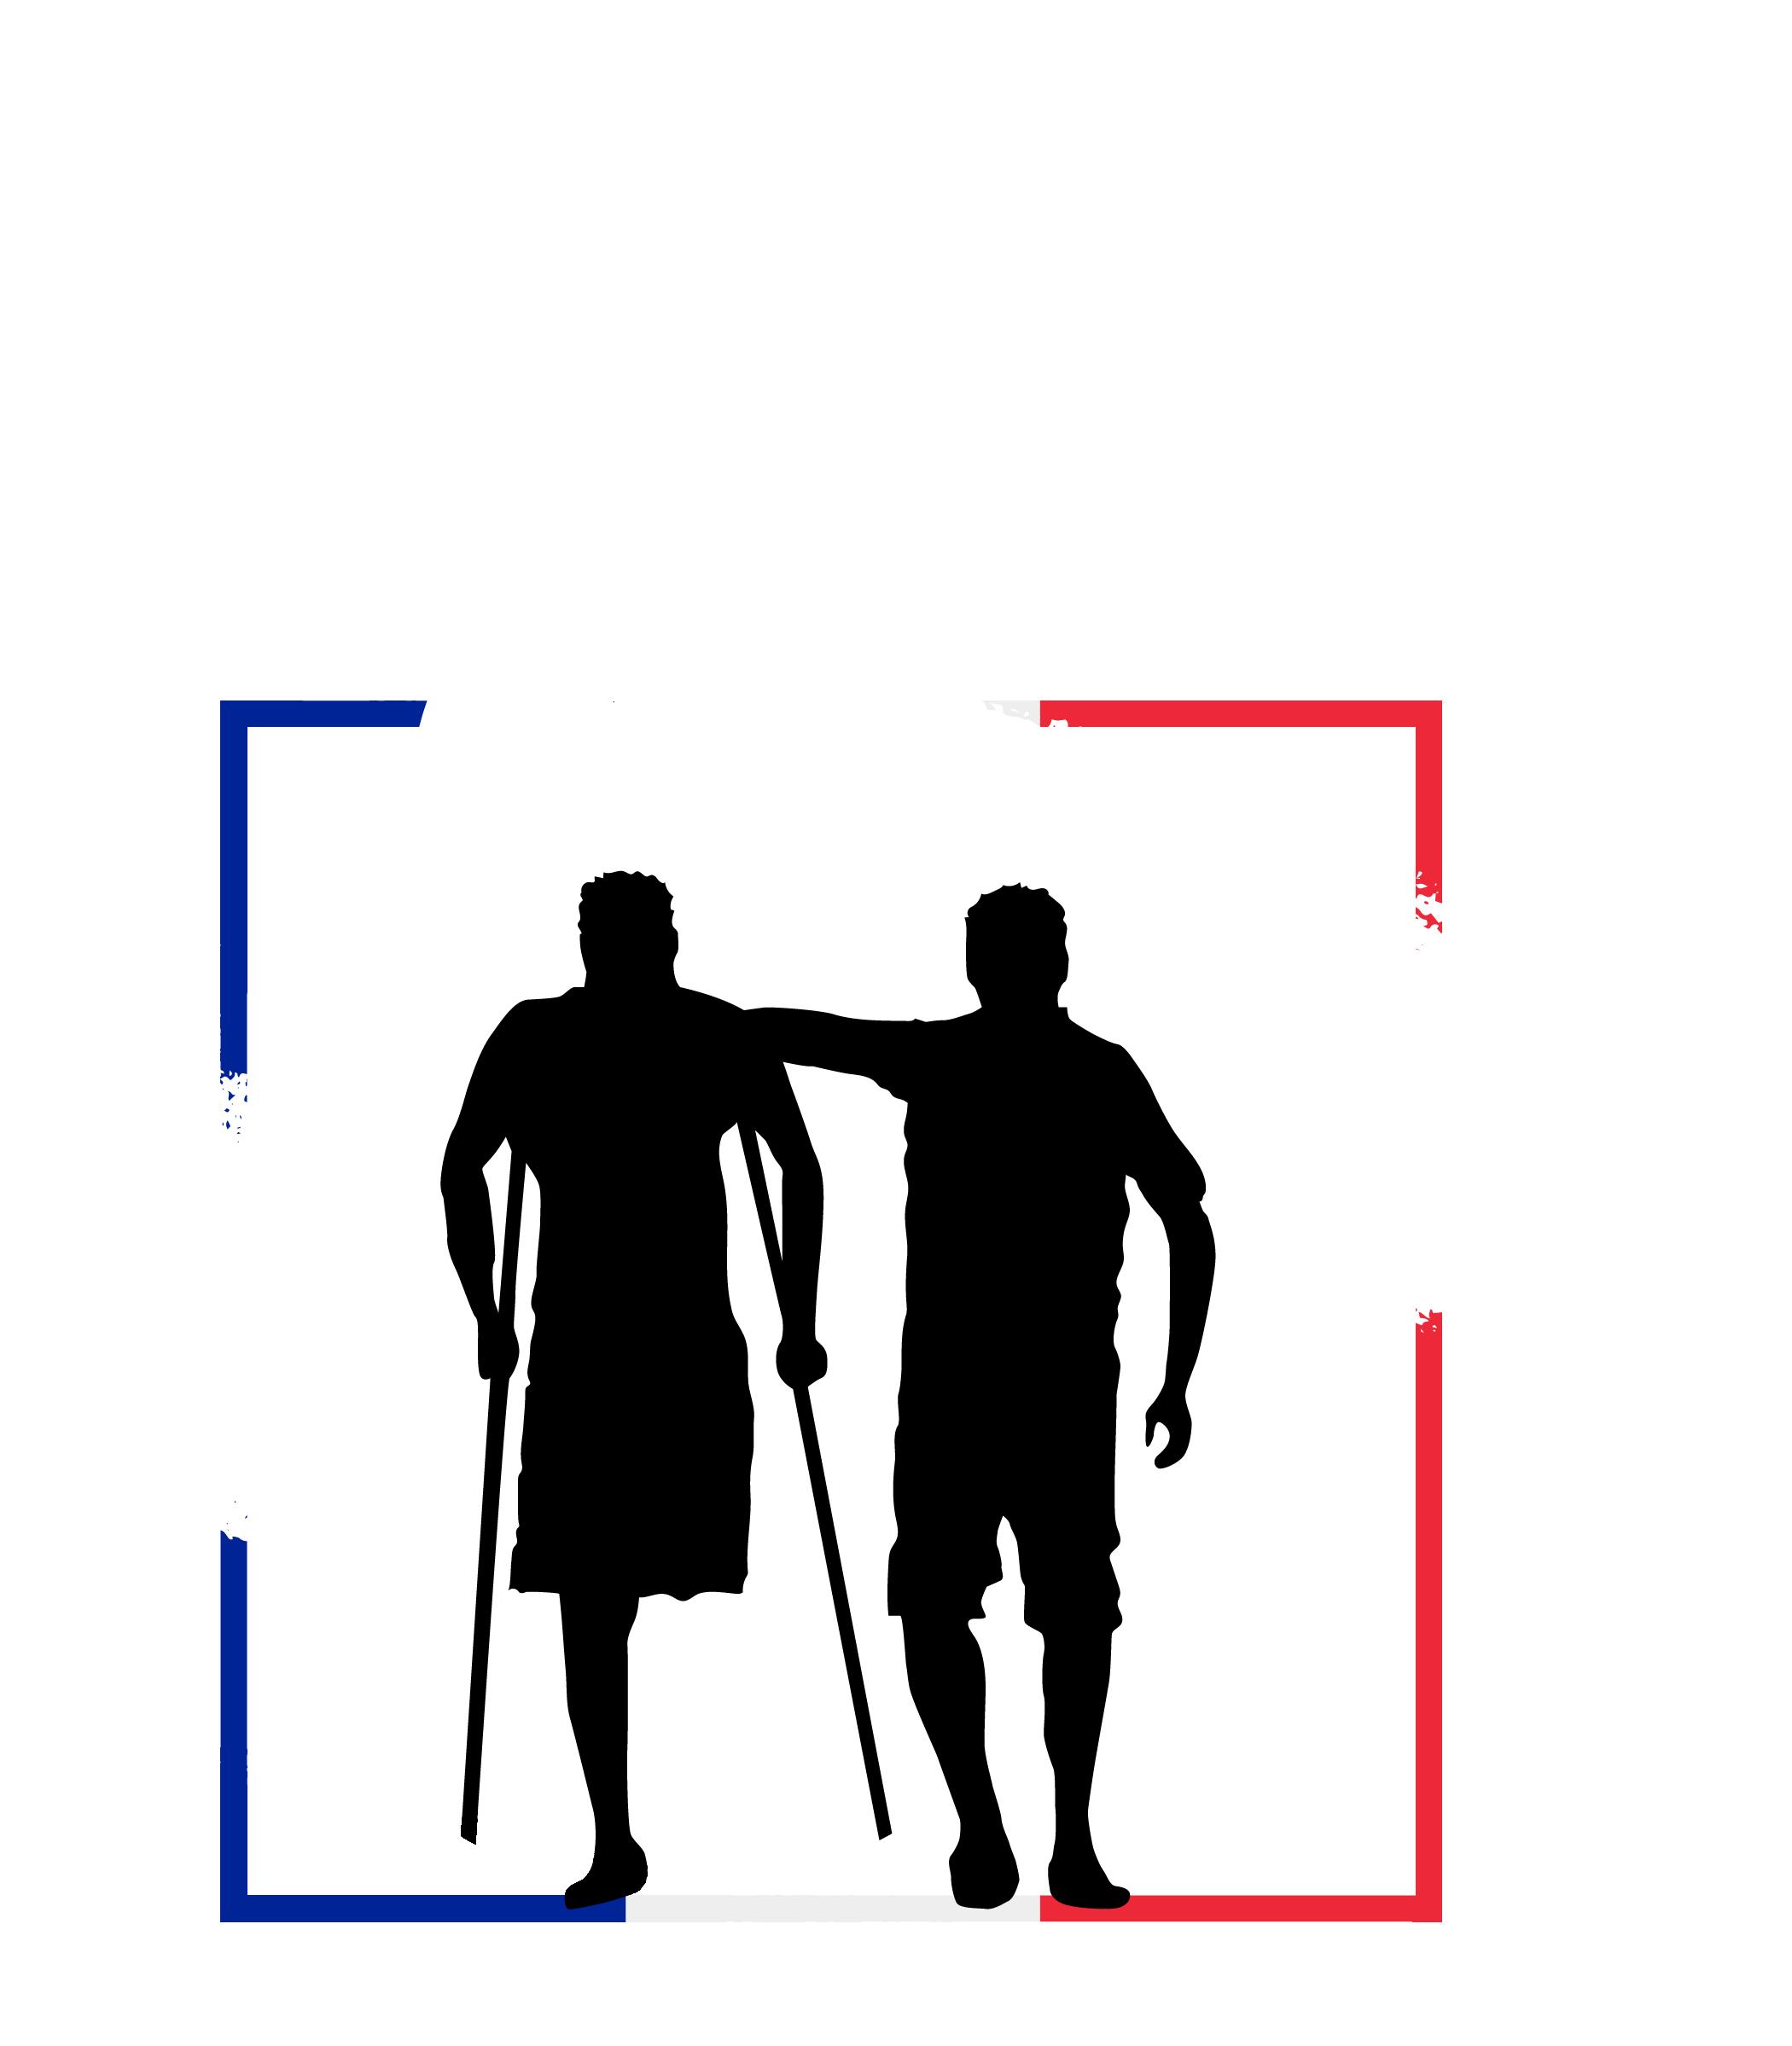 SEALS Team